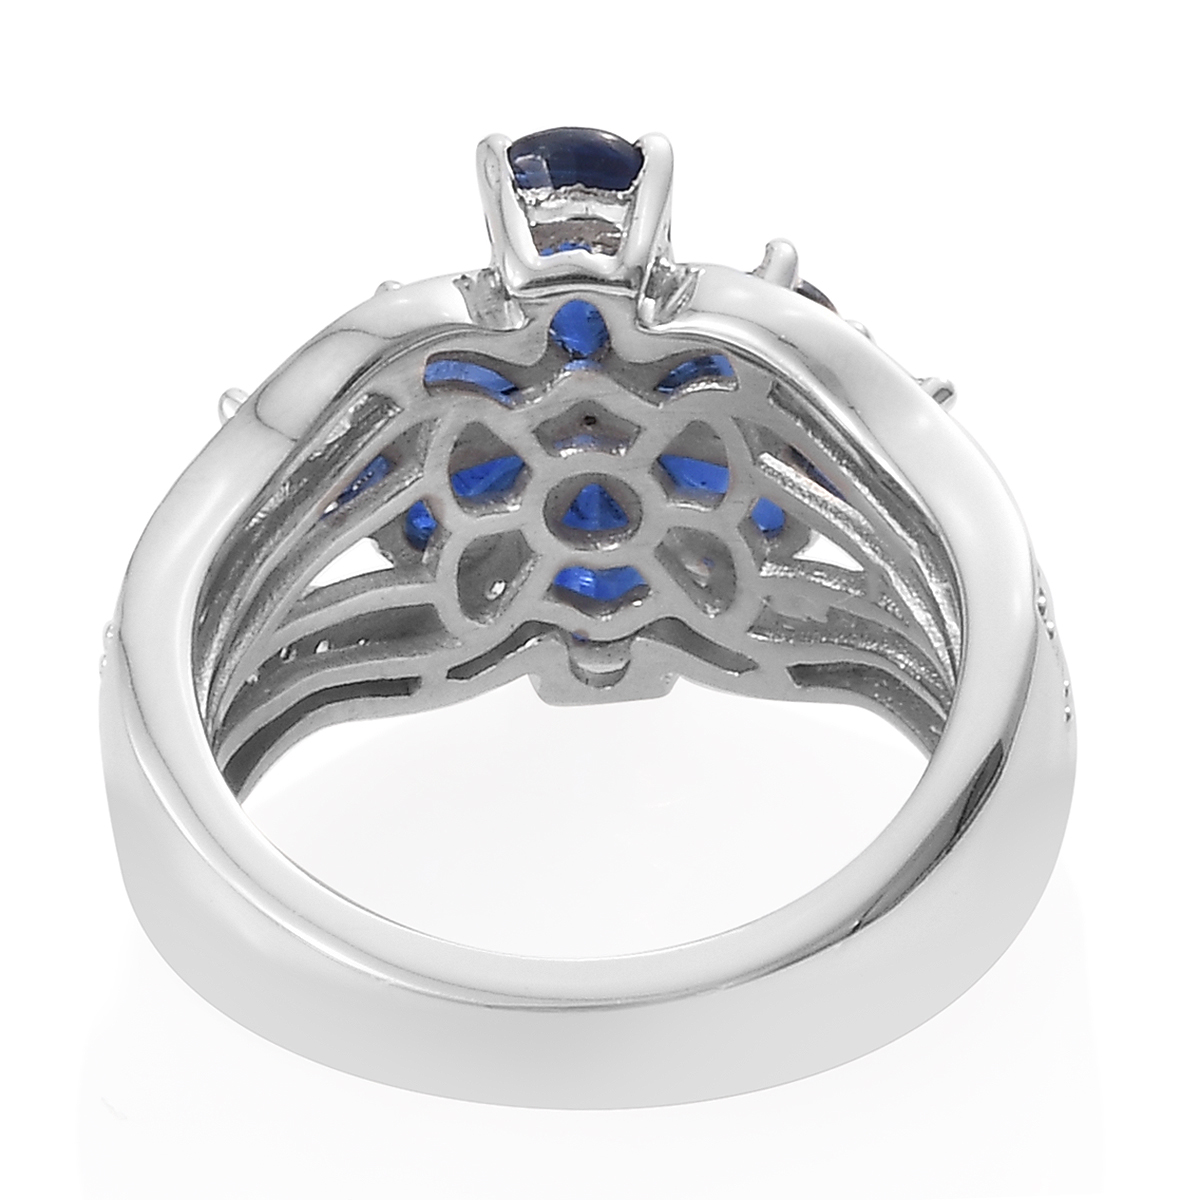 Kashmir Kyanite, Cambodian Zircon Flower Ring in Platinum Over Sterling Silver (Size 5.0) 3.07 ctw